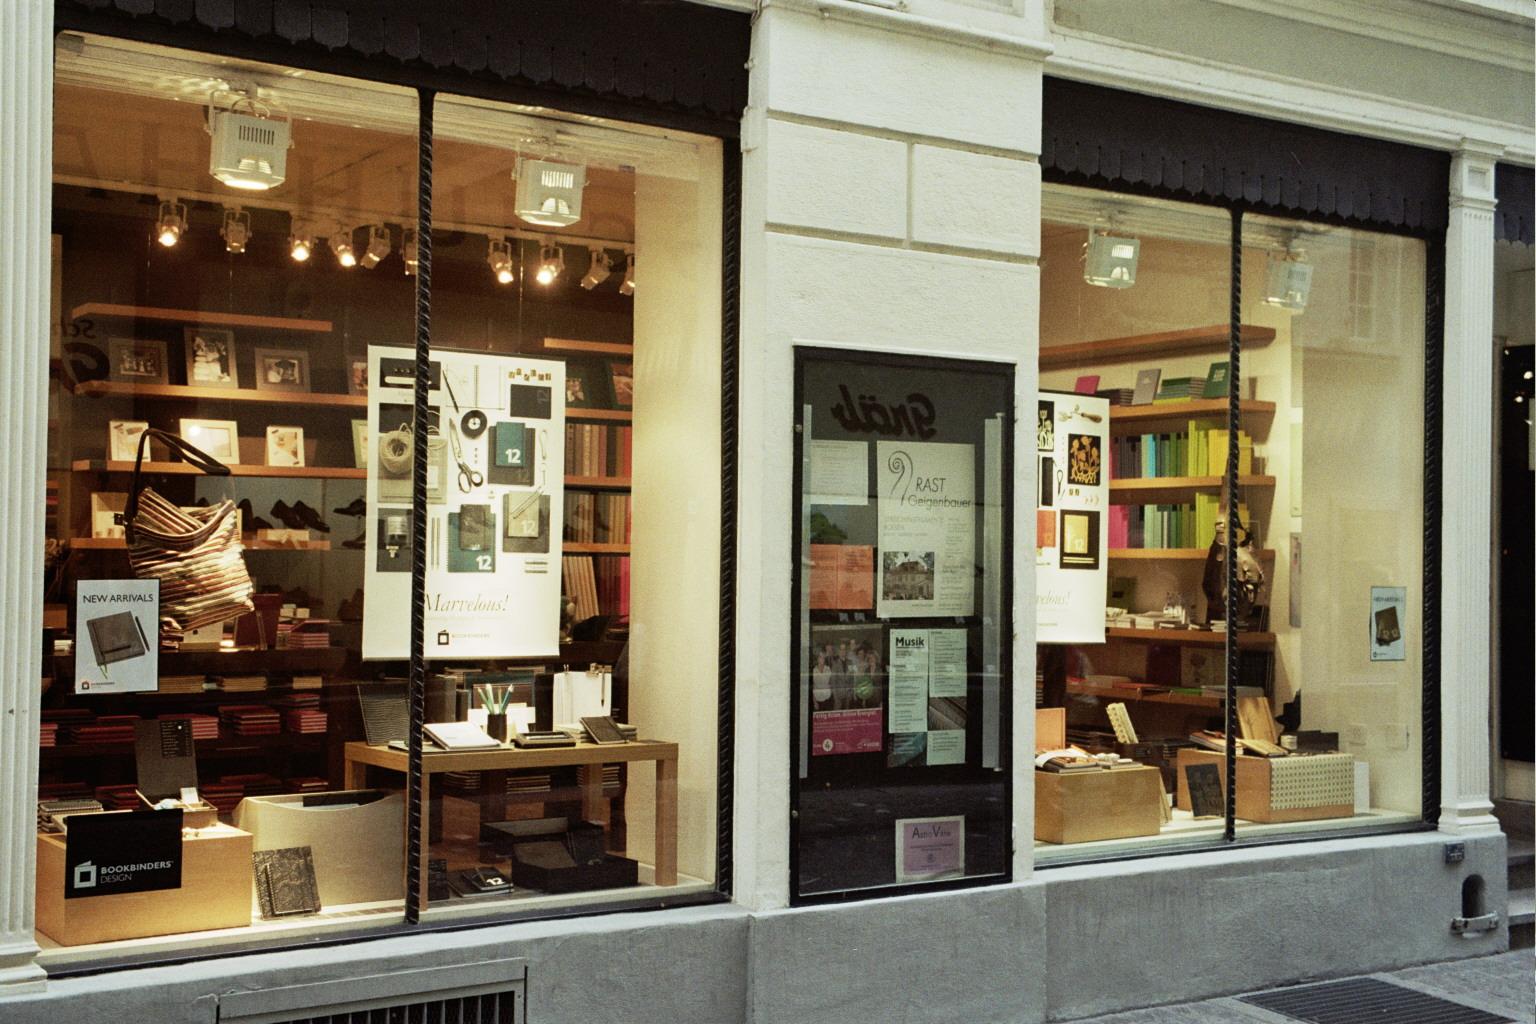 ubimedia mania et si les vitrines des magasins devenaient des planches pingles fa on pinterest. Black Bedroom Furniture Sets. Home Design Ideas